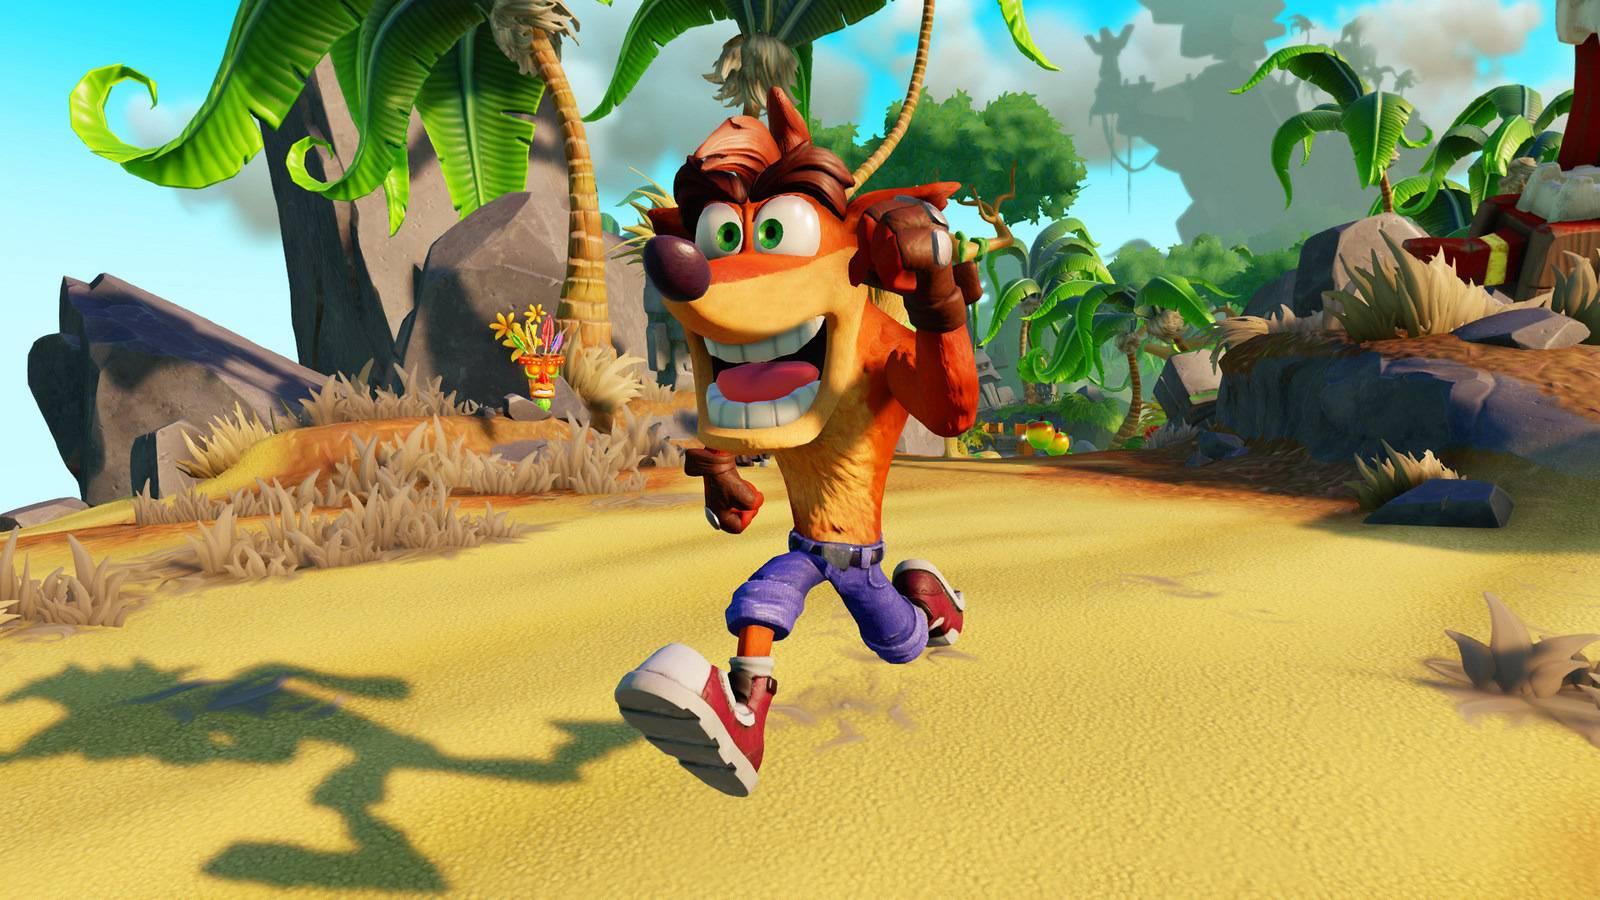 Crash Bandicoot Playstation experience www.culturageek.com.ar